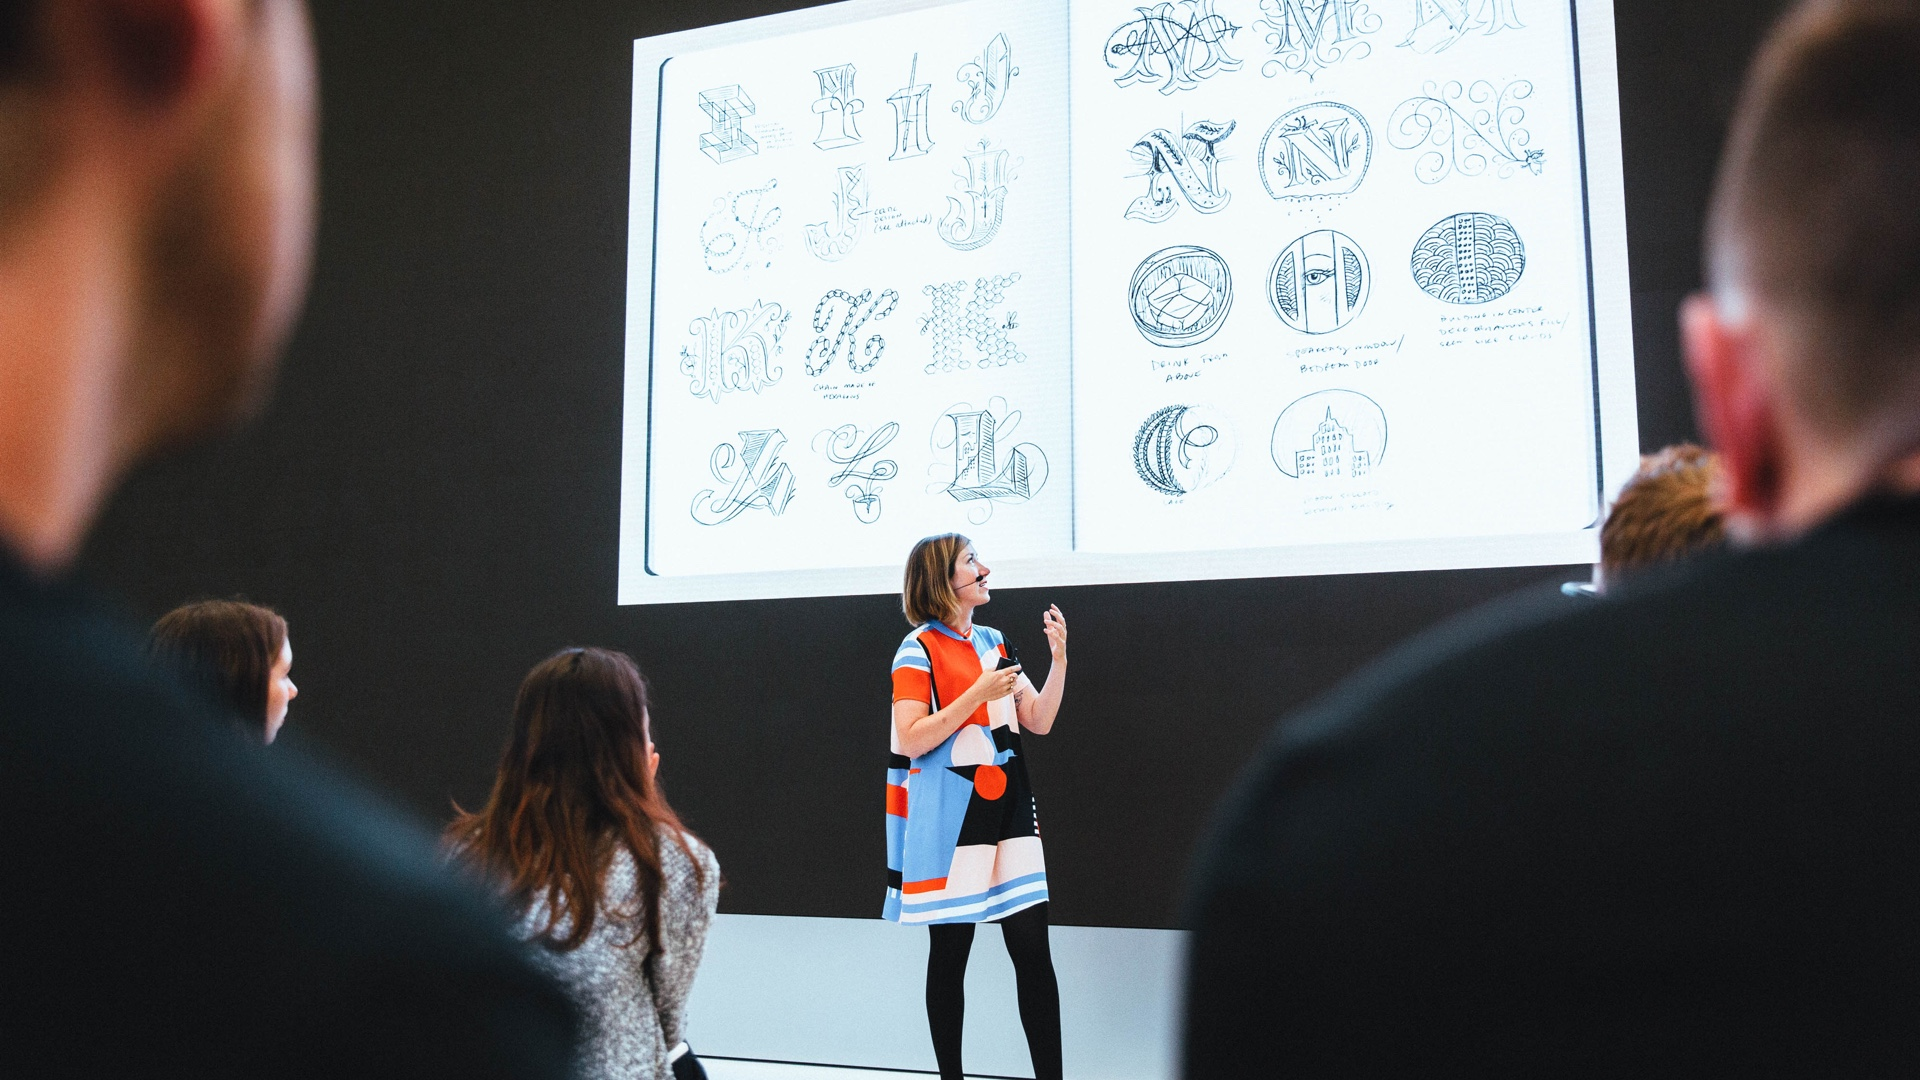 Apple Store workshop typografie Jessica Hische